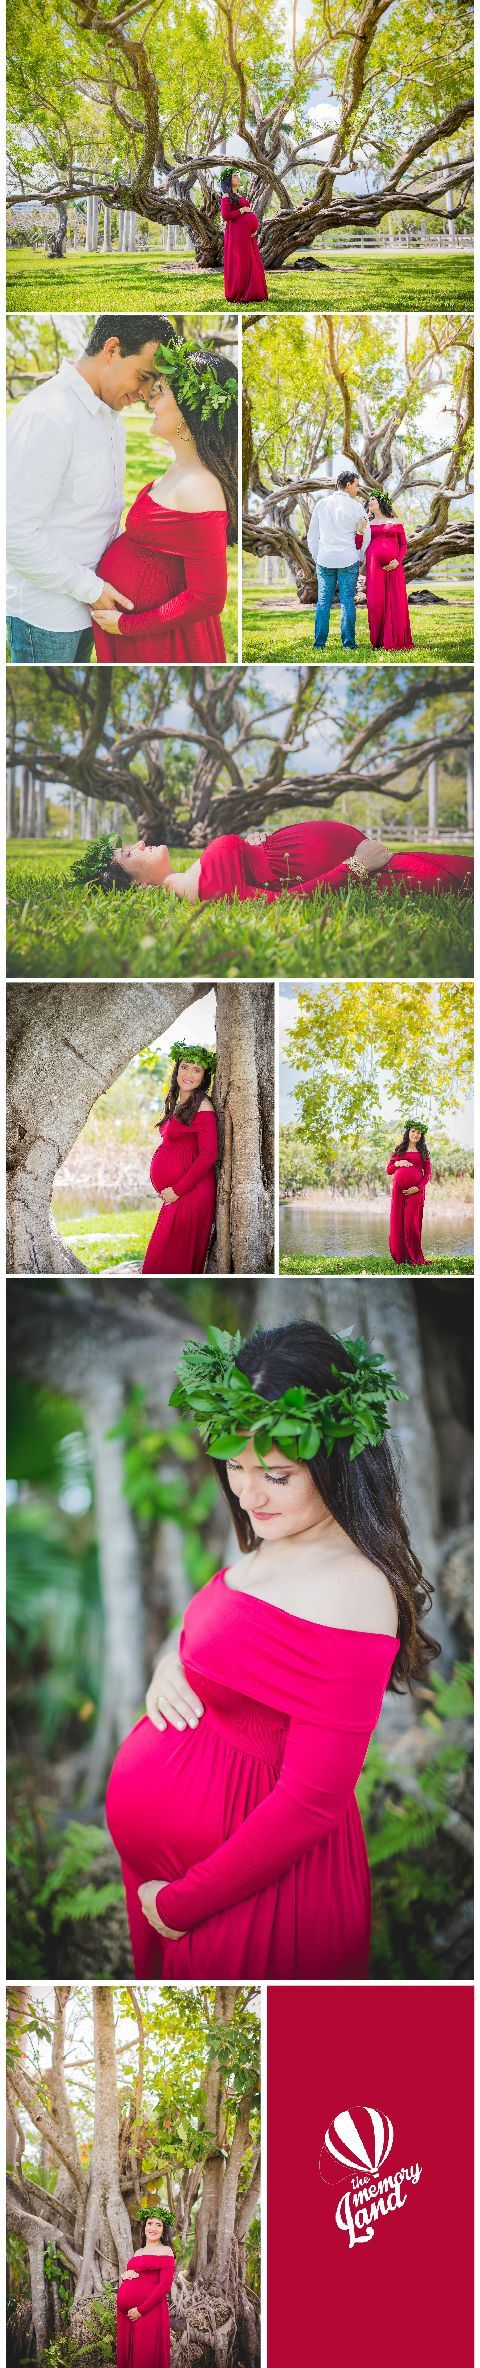 Pregnancy. Pregnancy Inspiration. Baby Bump. Couple. Couple goals. Miami. Beach. Portrait. Photography. Photoshoot. Park. Photography. Maternity photos. Pregnancy Photos Ideas. Photographer. Check out more of our work :) www.thememoryland.com